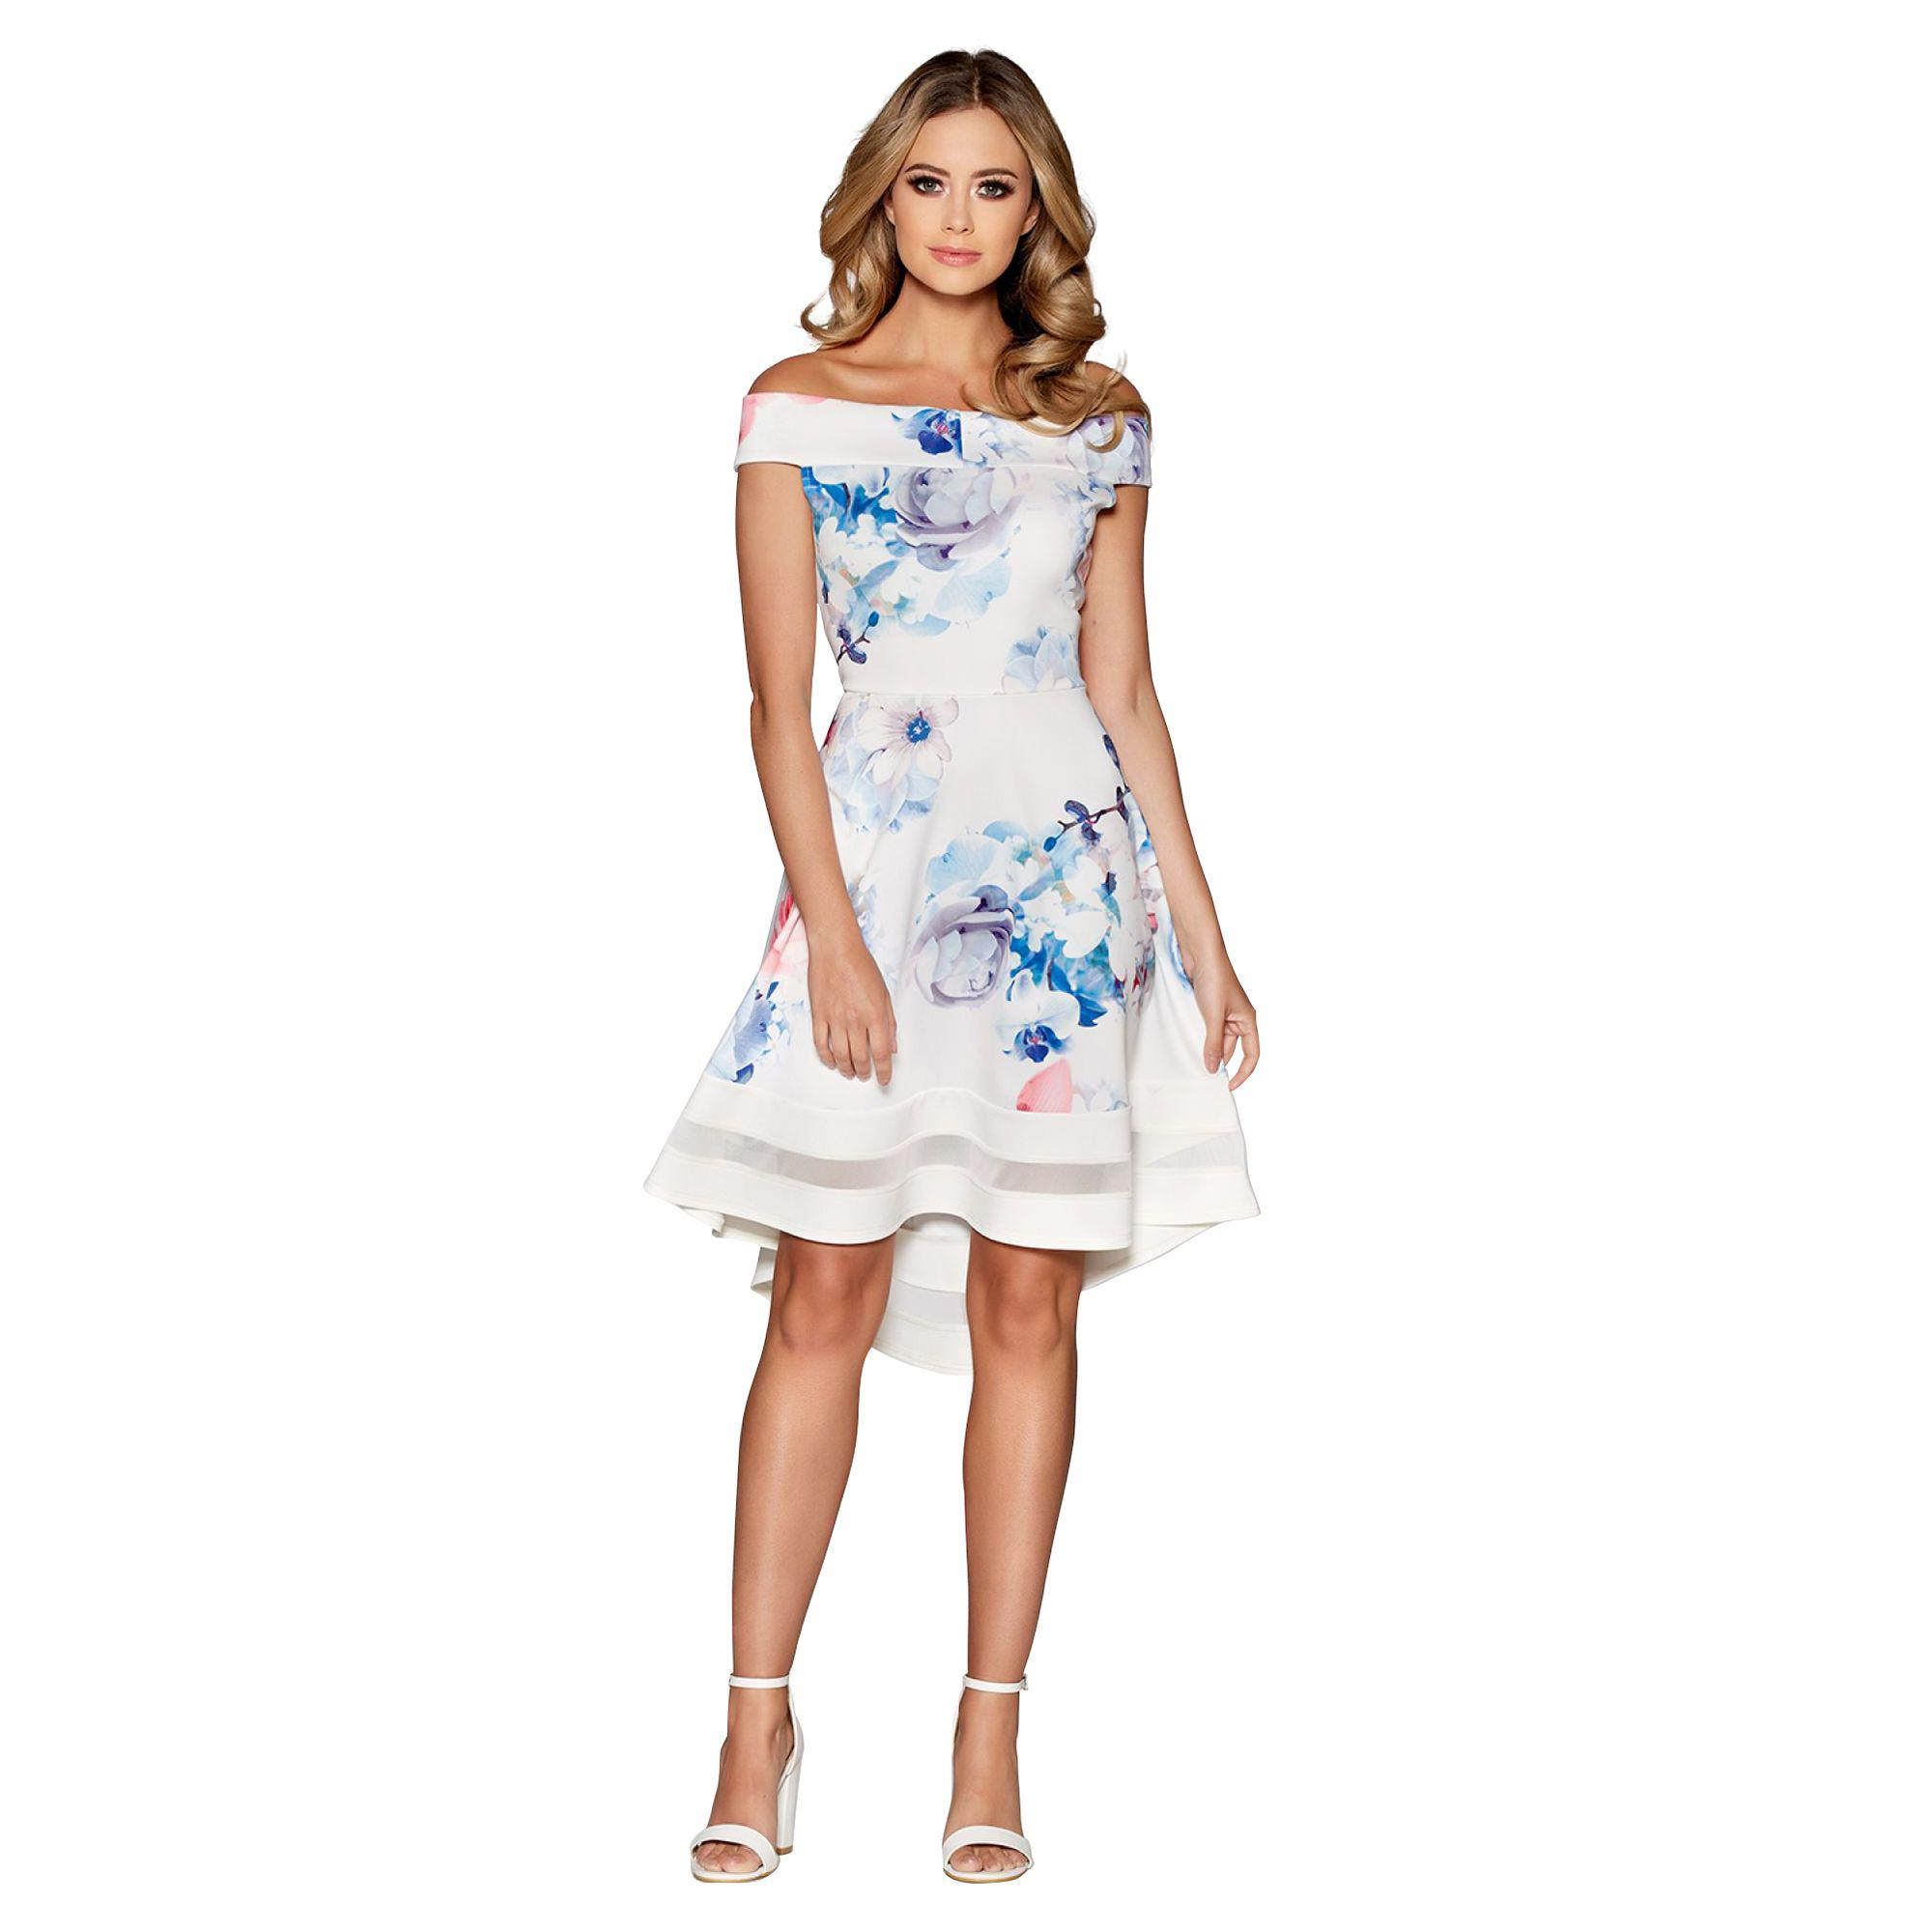 135f7275a4c7 Quiz Cream Blue And Pink Floral Print Bardot Dip Hem Dress in Blue ...